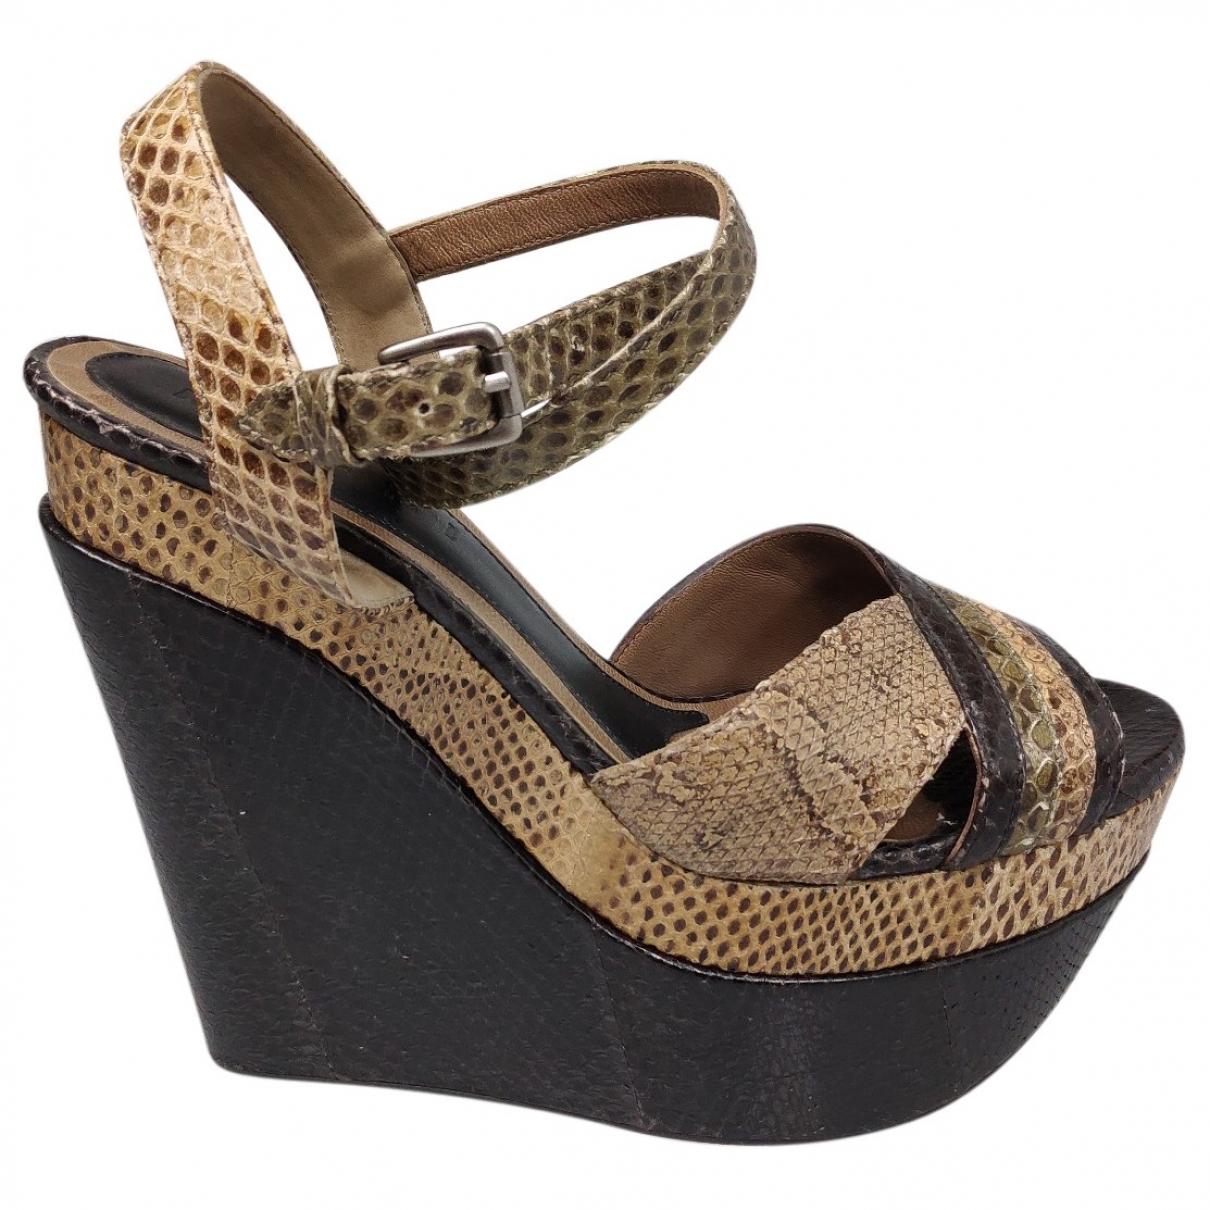 Marni \N Beige Leather Sandals for Women 36 EU